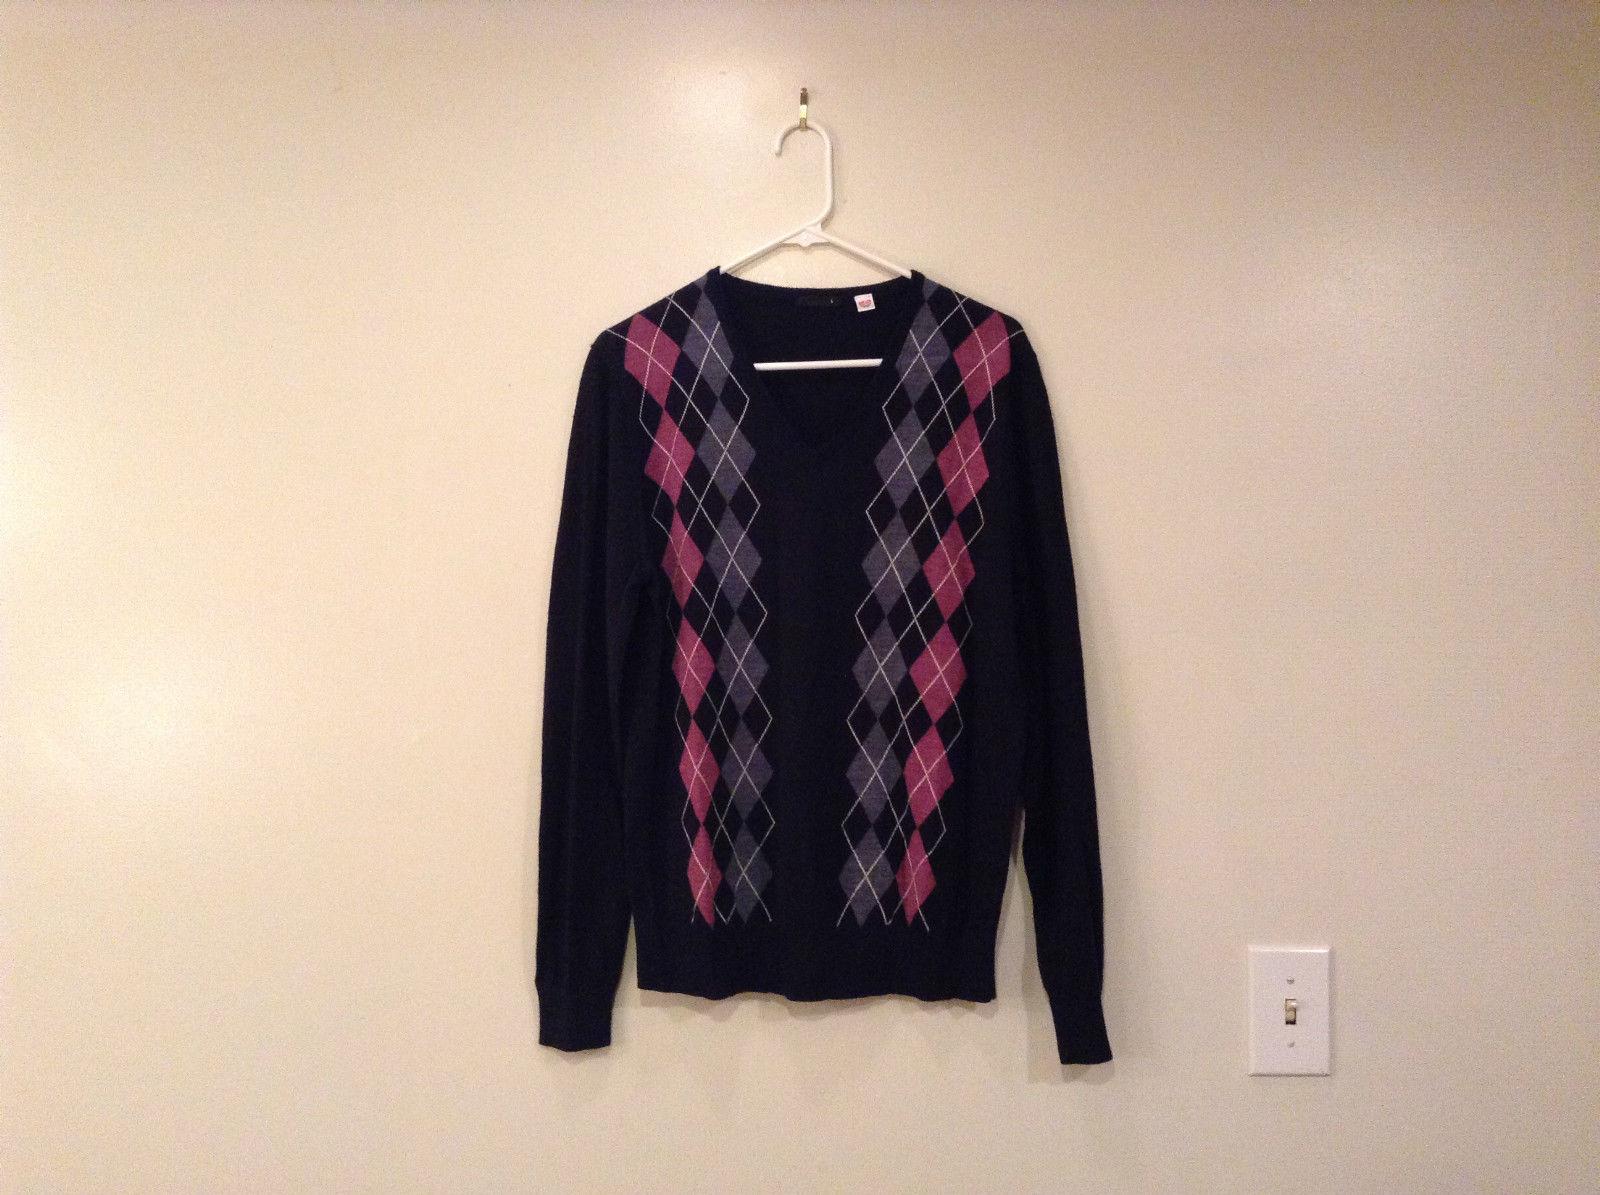 Uniqlo V Neck Black with Classic Diamond Pink Gray Pattern Sweater Size Large